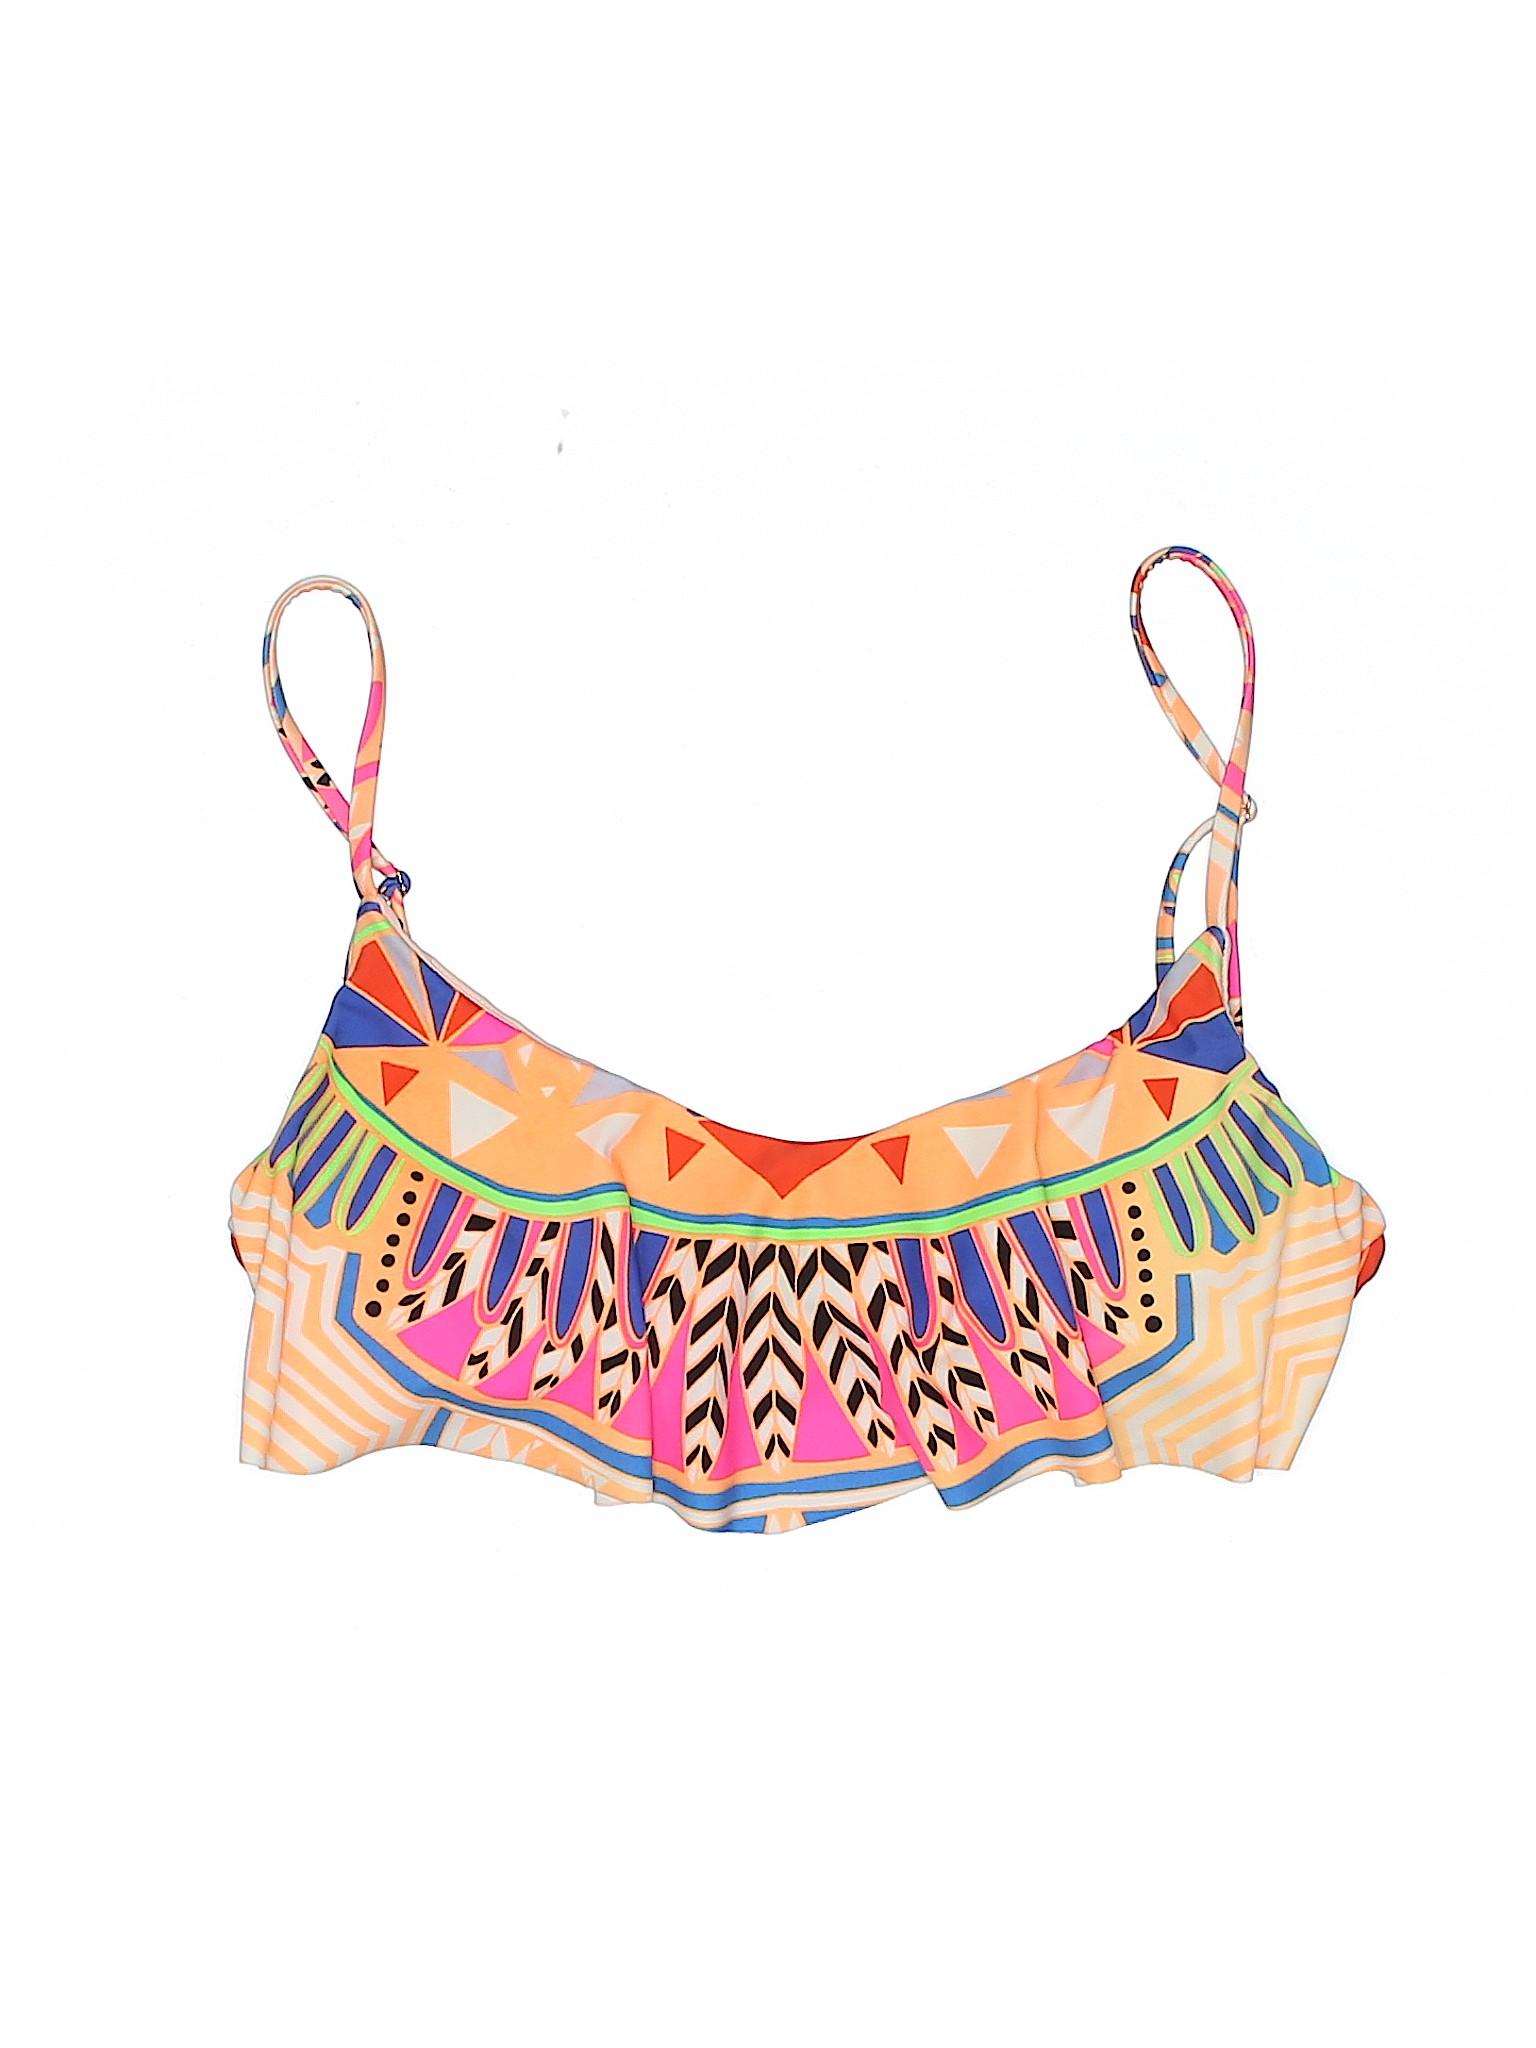 Mara Hoffman Top Boutique Swimsuit Boutique Mara UqwTSO6zZ